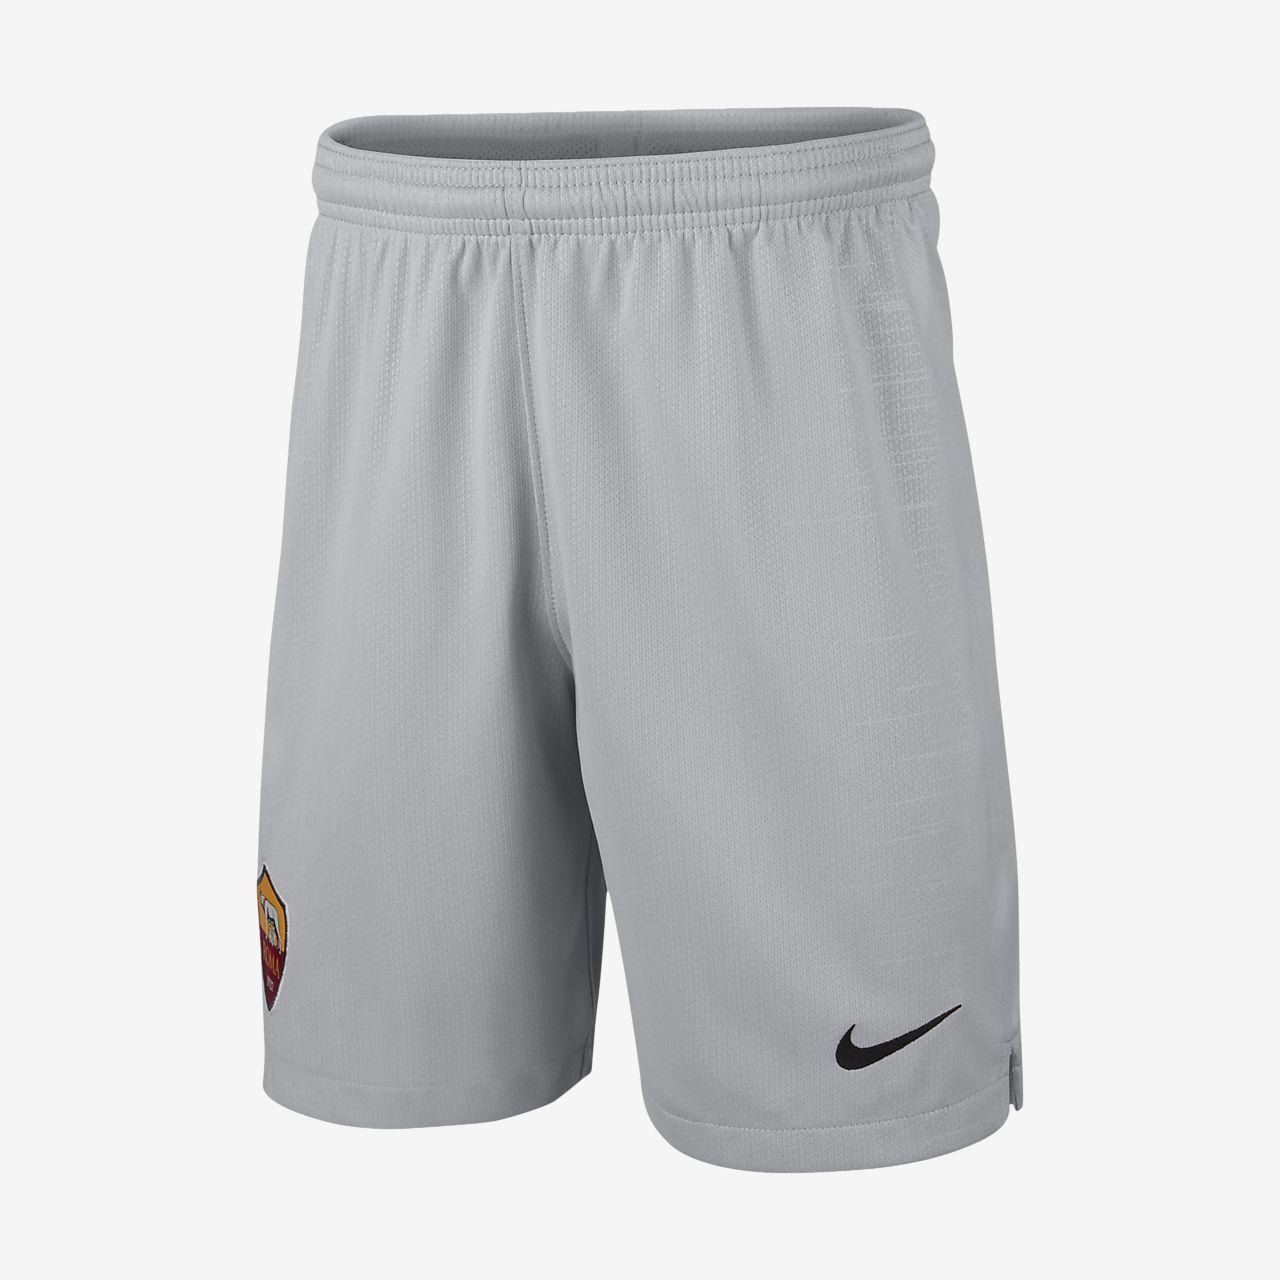 2018/19 A.S. Roma Stadium Home/Away Older Kids' Football Shorts